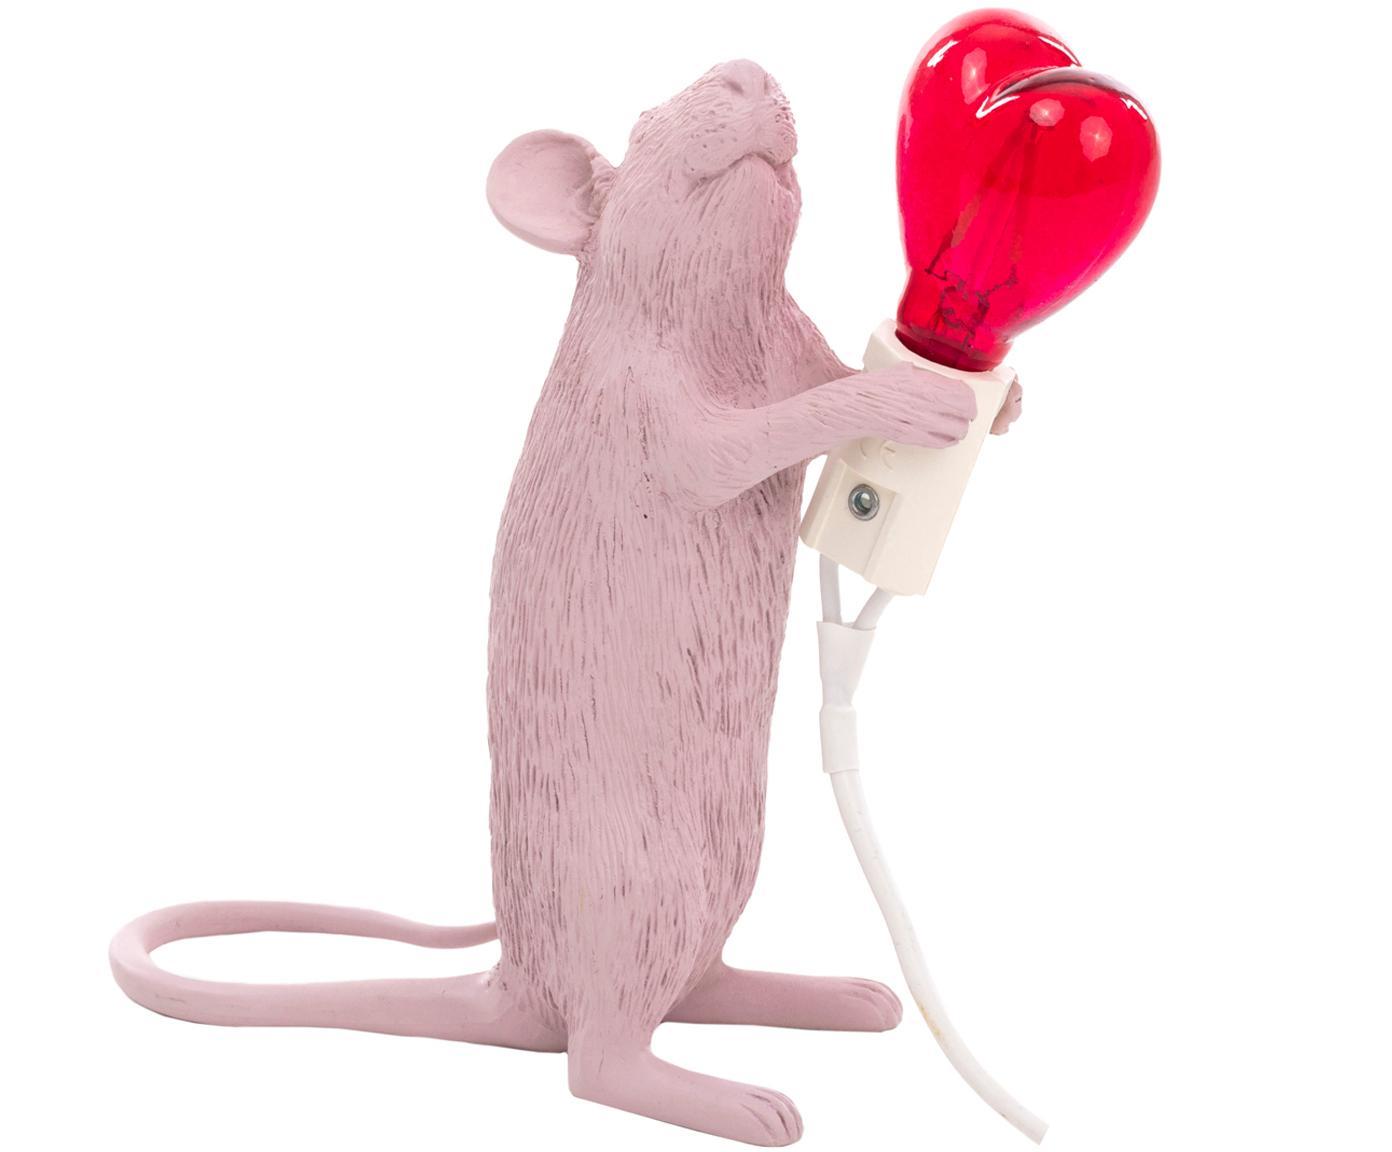 Design Tischleuchte Mouse Love, Rosa, Rot, 6 x 15 cm